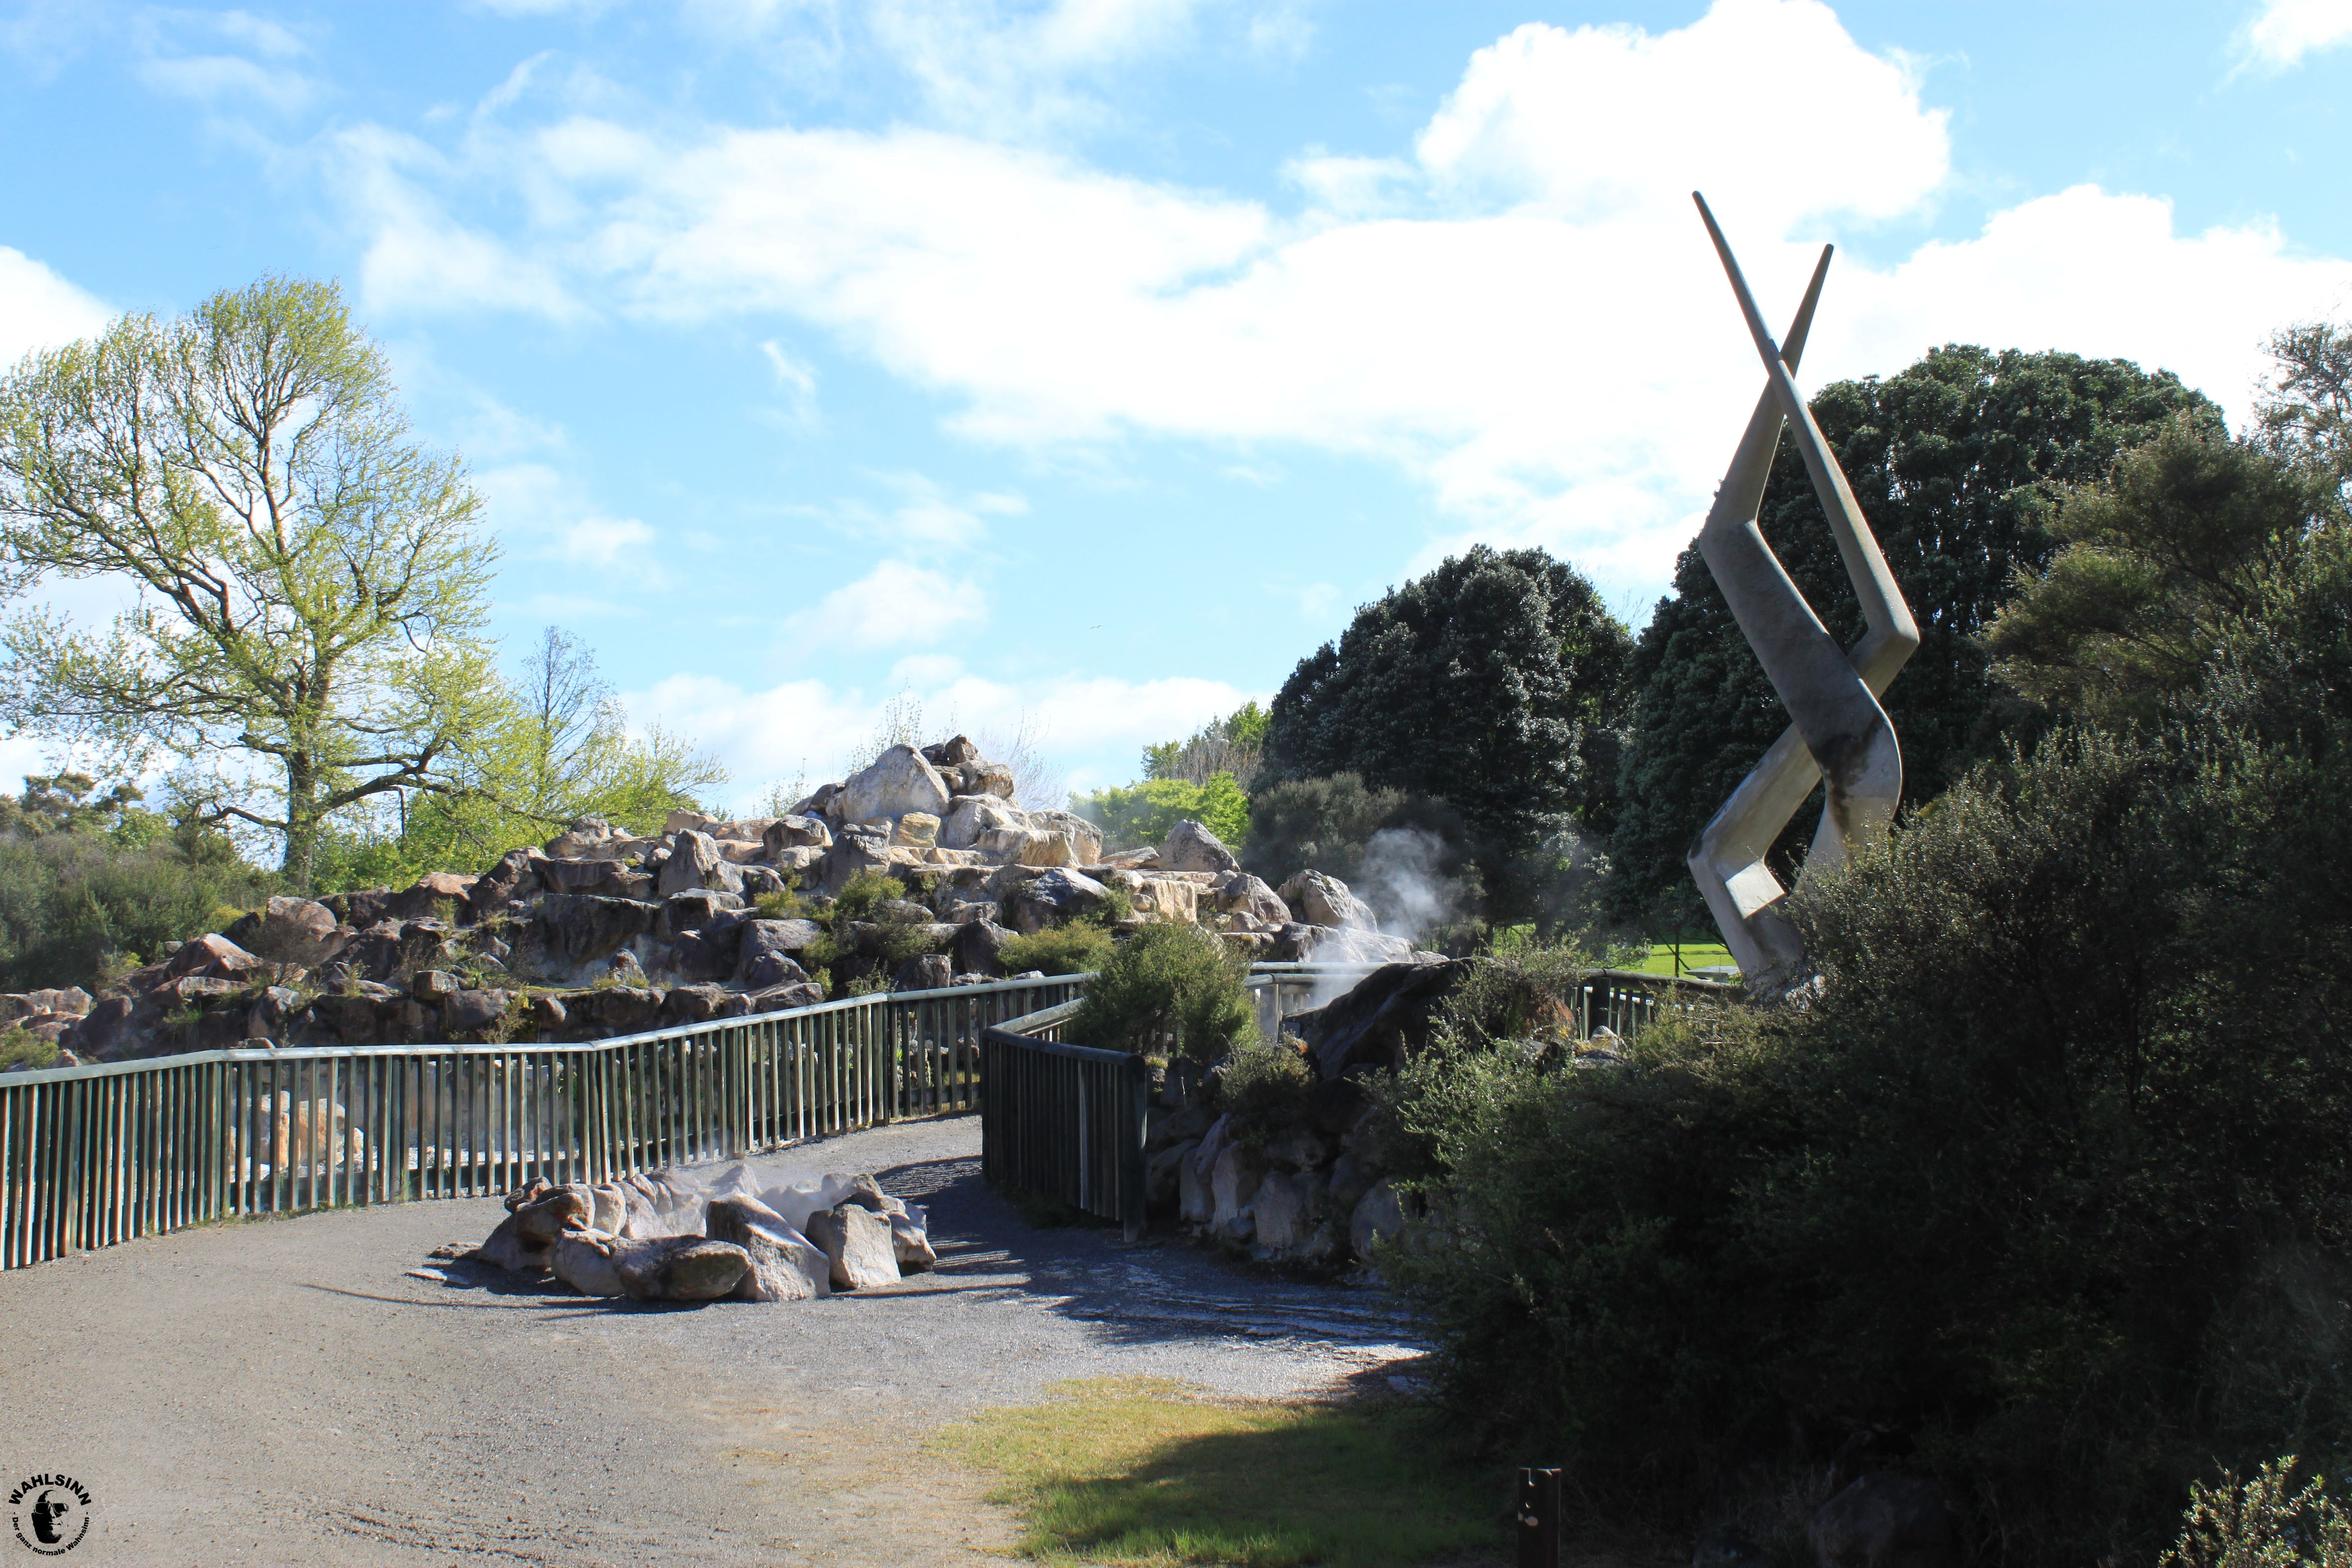 Amoklauf Neuseeland Video Pinterest: Rotorua (Neuseeland)